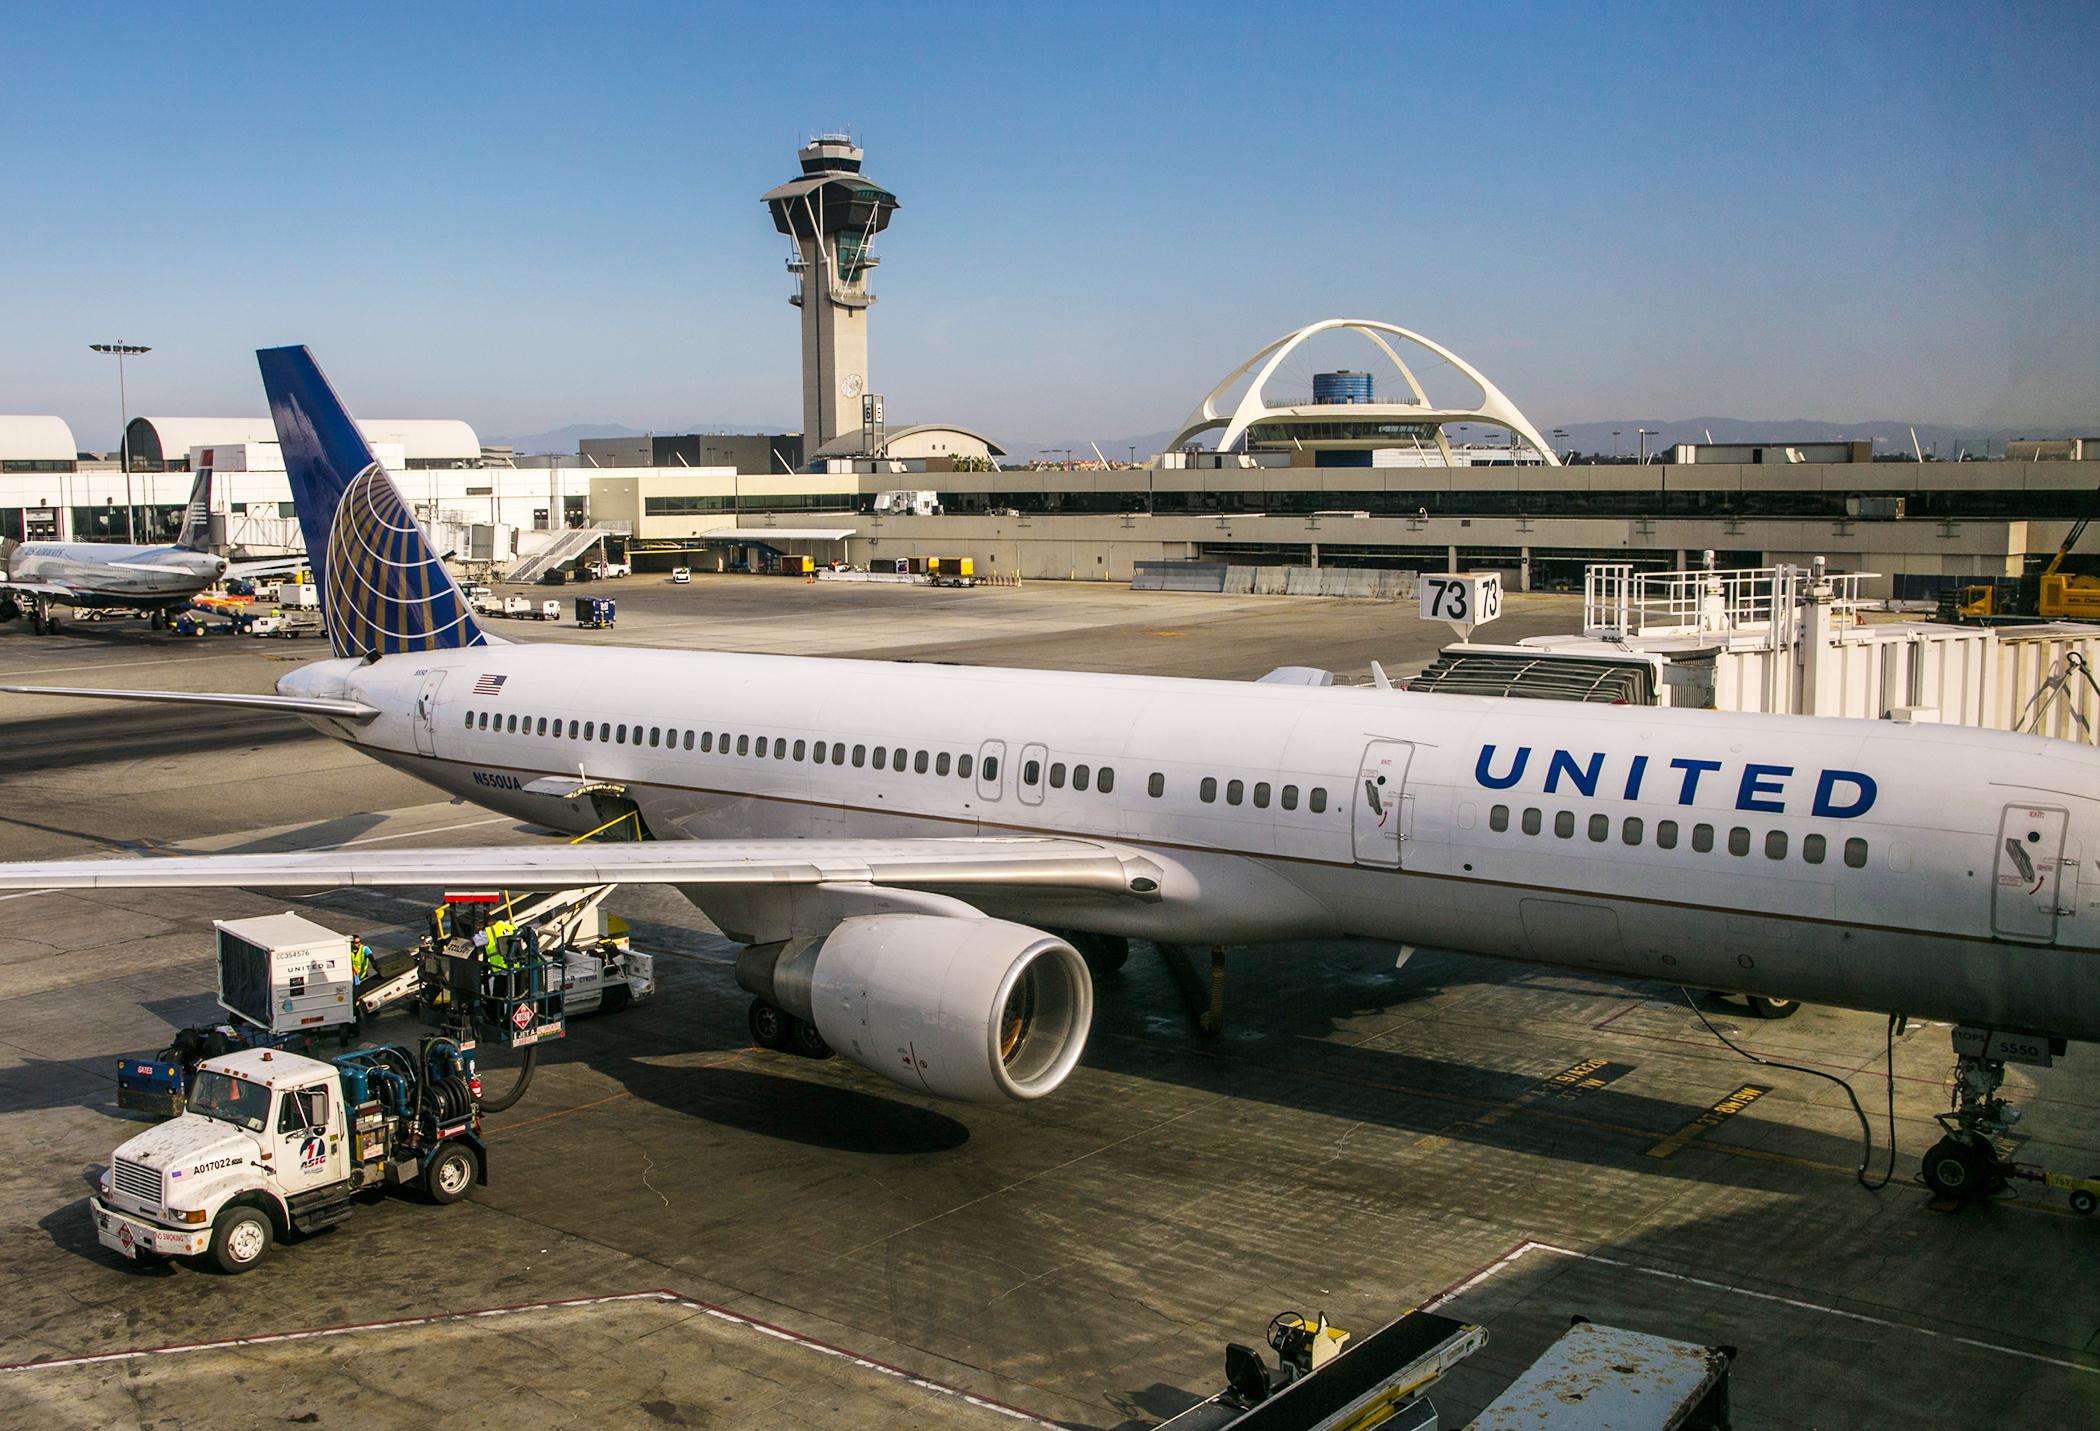 United Airways airplane on tarmac